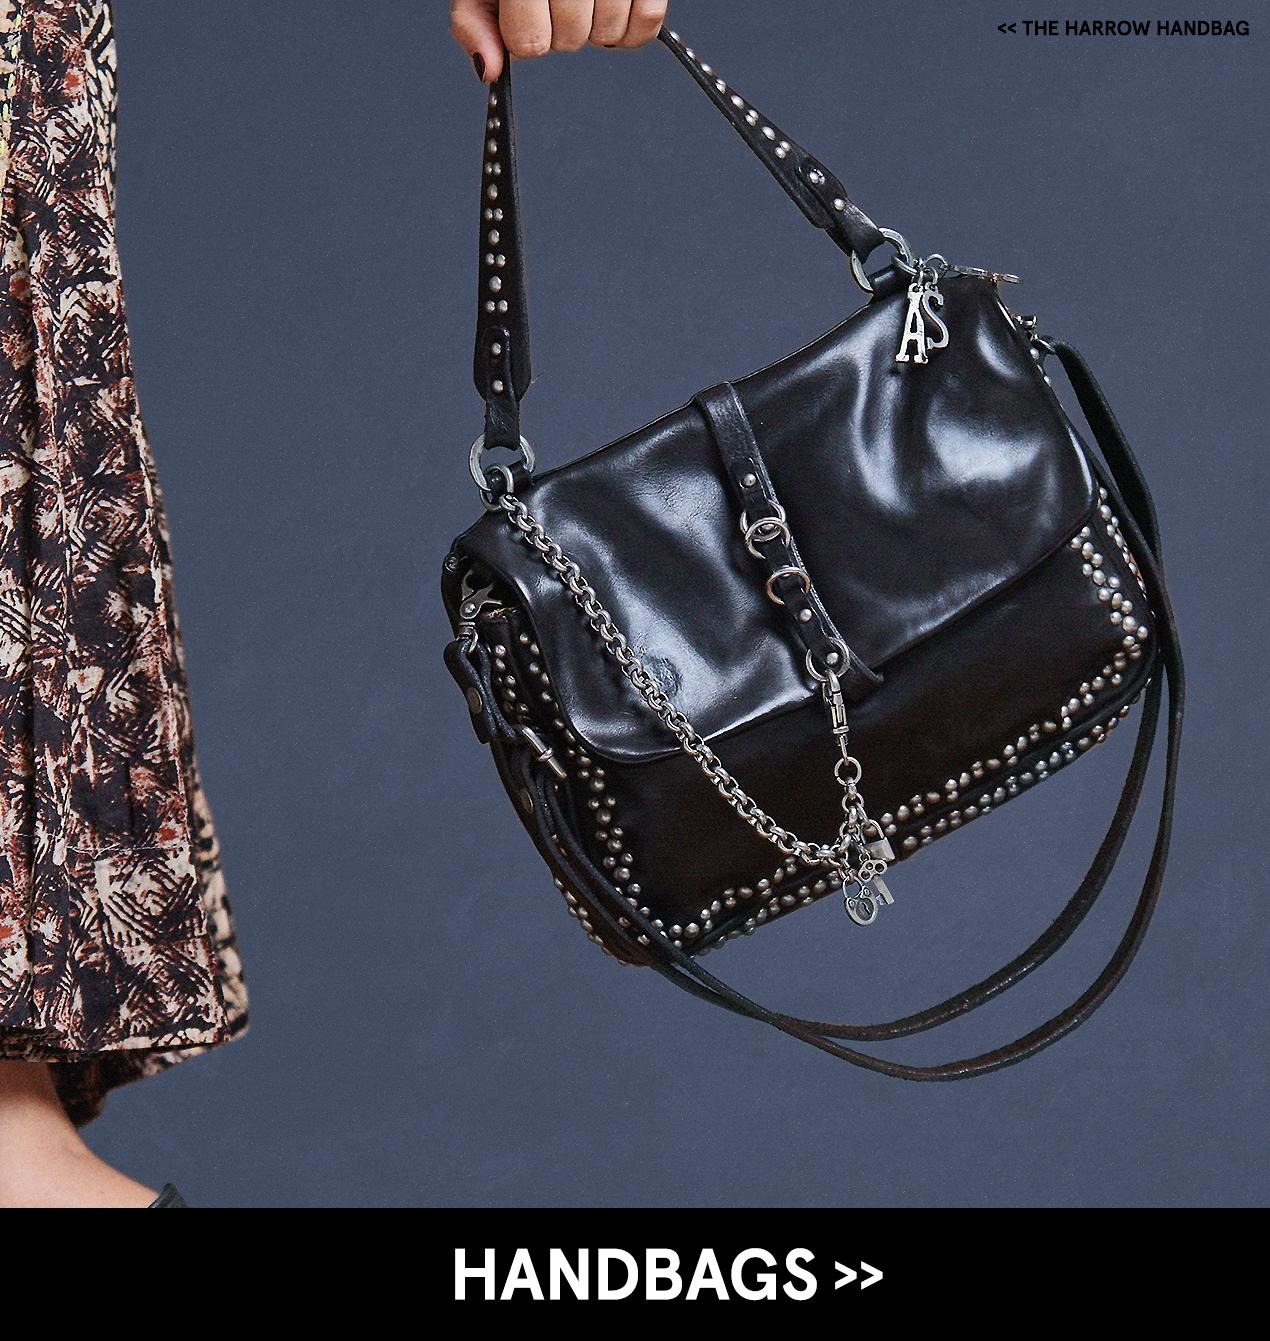 A.S.98 Handbags